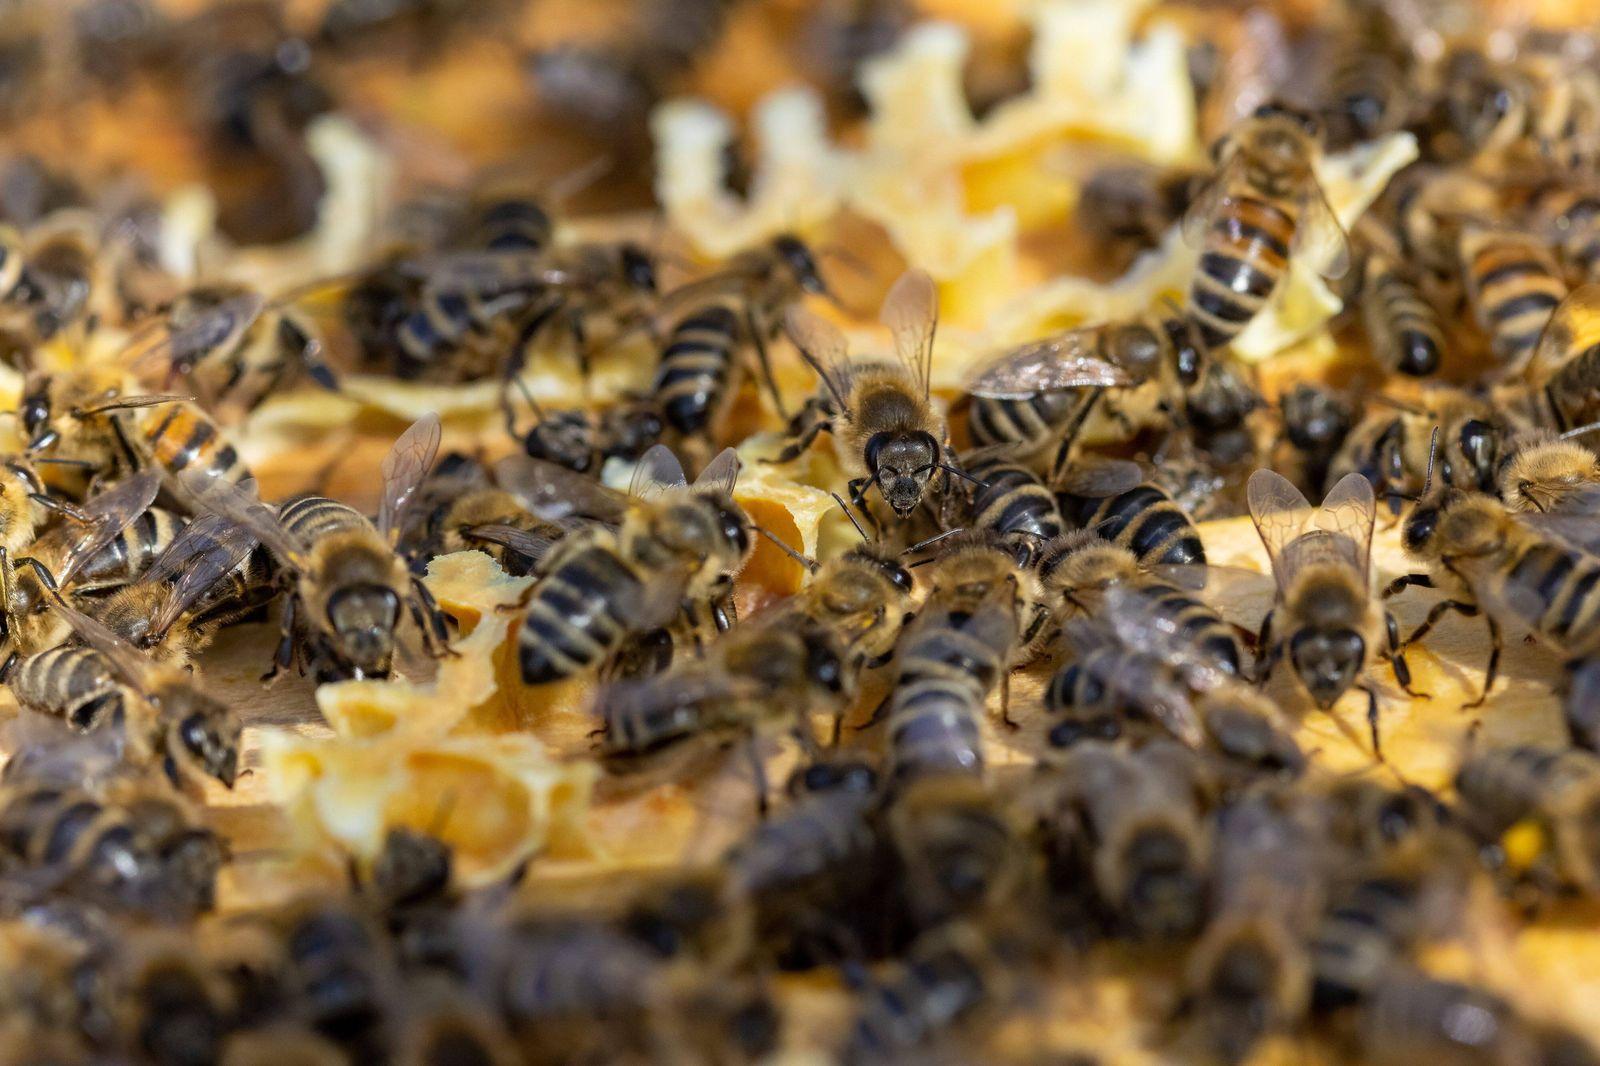 Wiesbaden, 22.04.2021, Honigbienen, Honigbienen auf dem Holzrahmen an dem die Honigbienen ihre Waben bauen Wiesbaden Hes